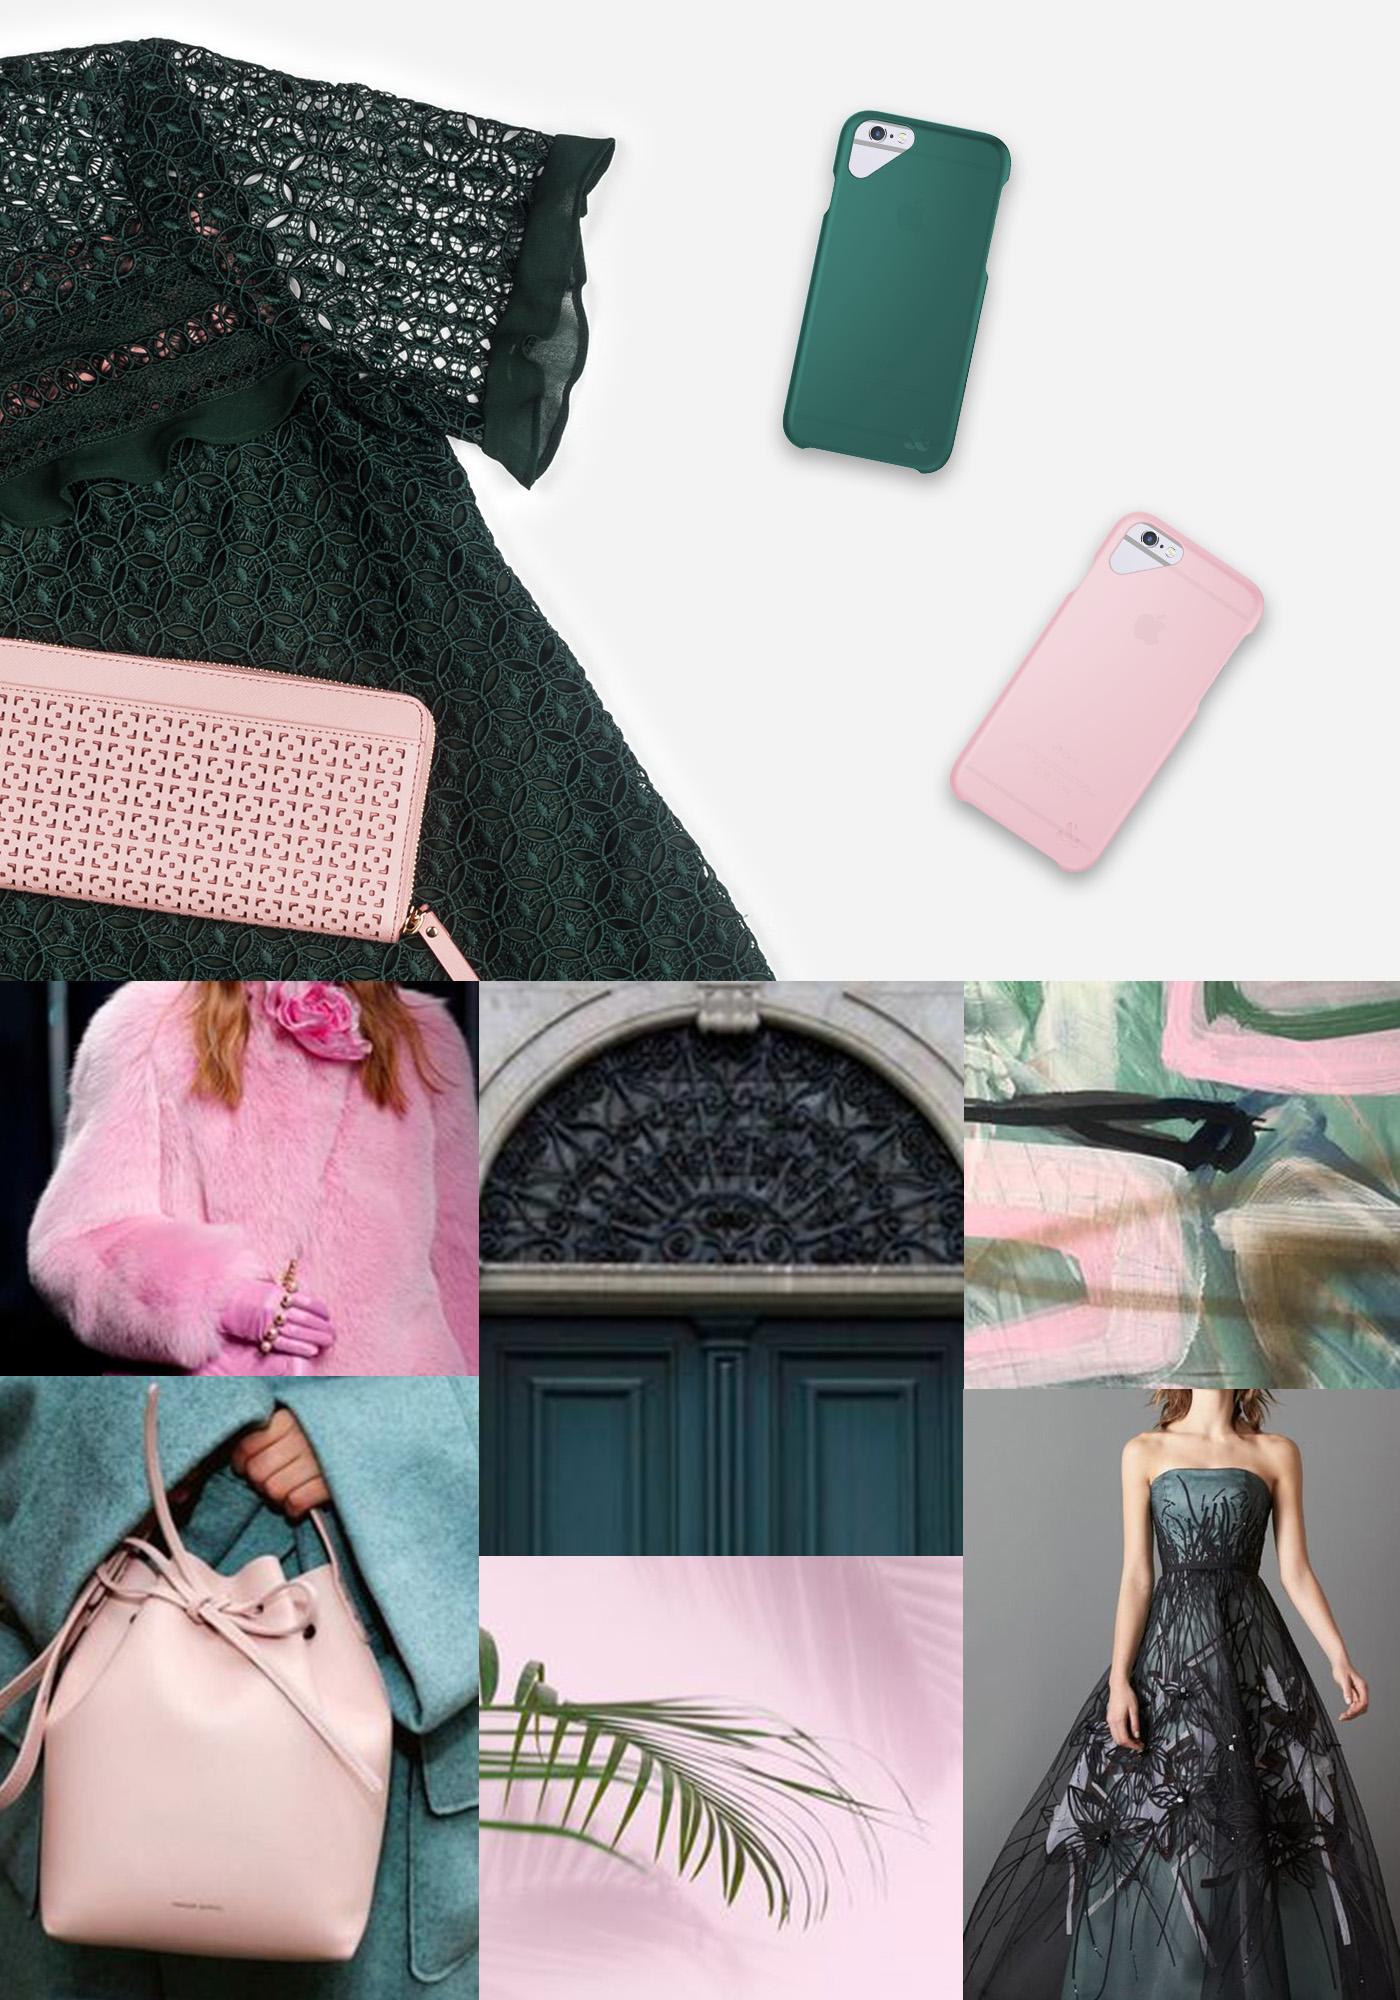 Gucci, Domino Magazine, Tracy Kessler, Mansur Gavriel, Mylittlefabric.com, Carolina Herrea